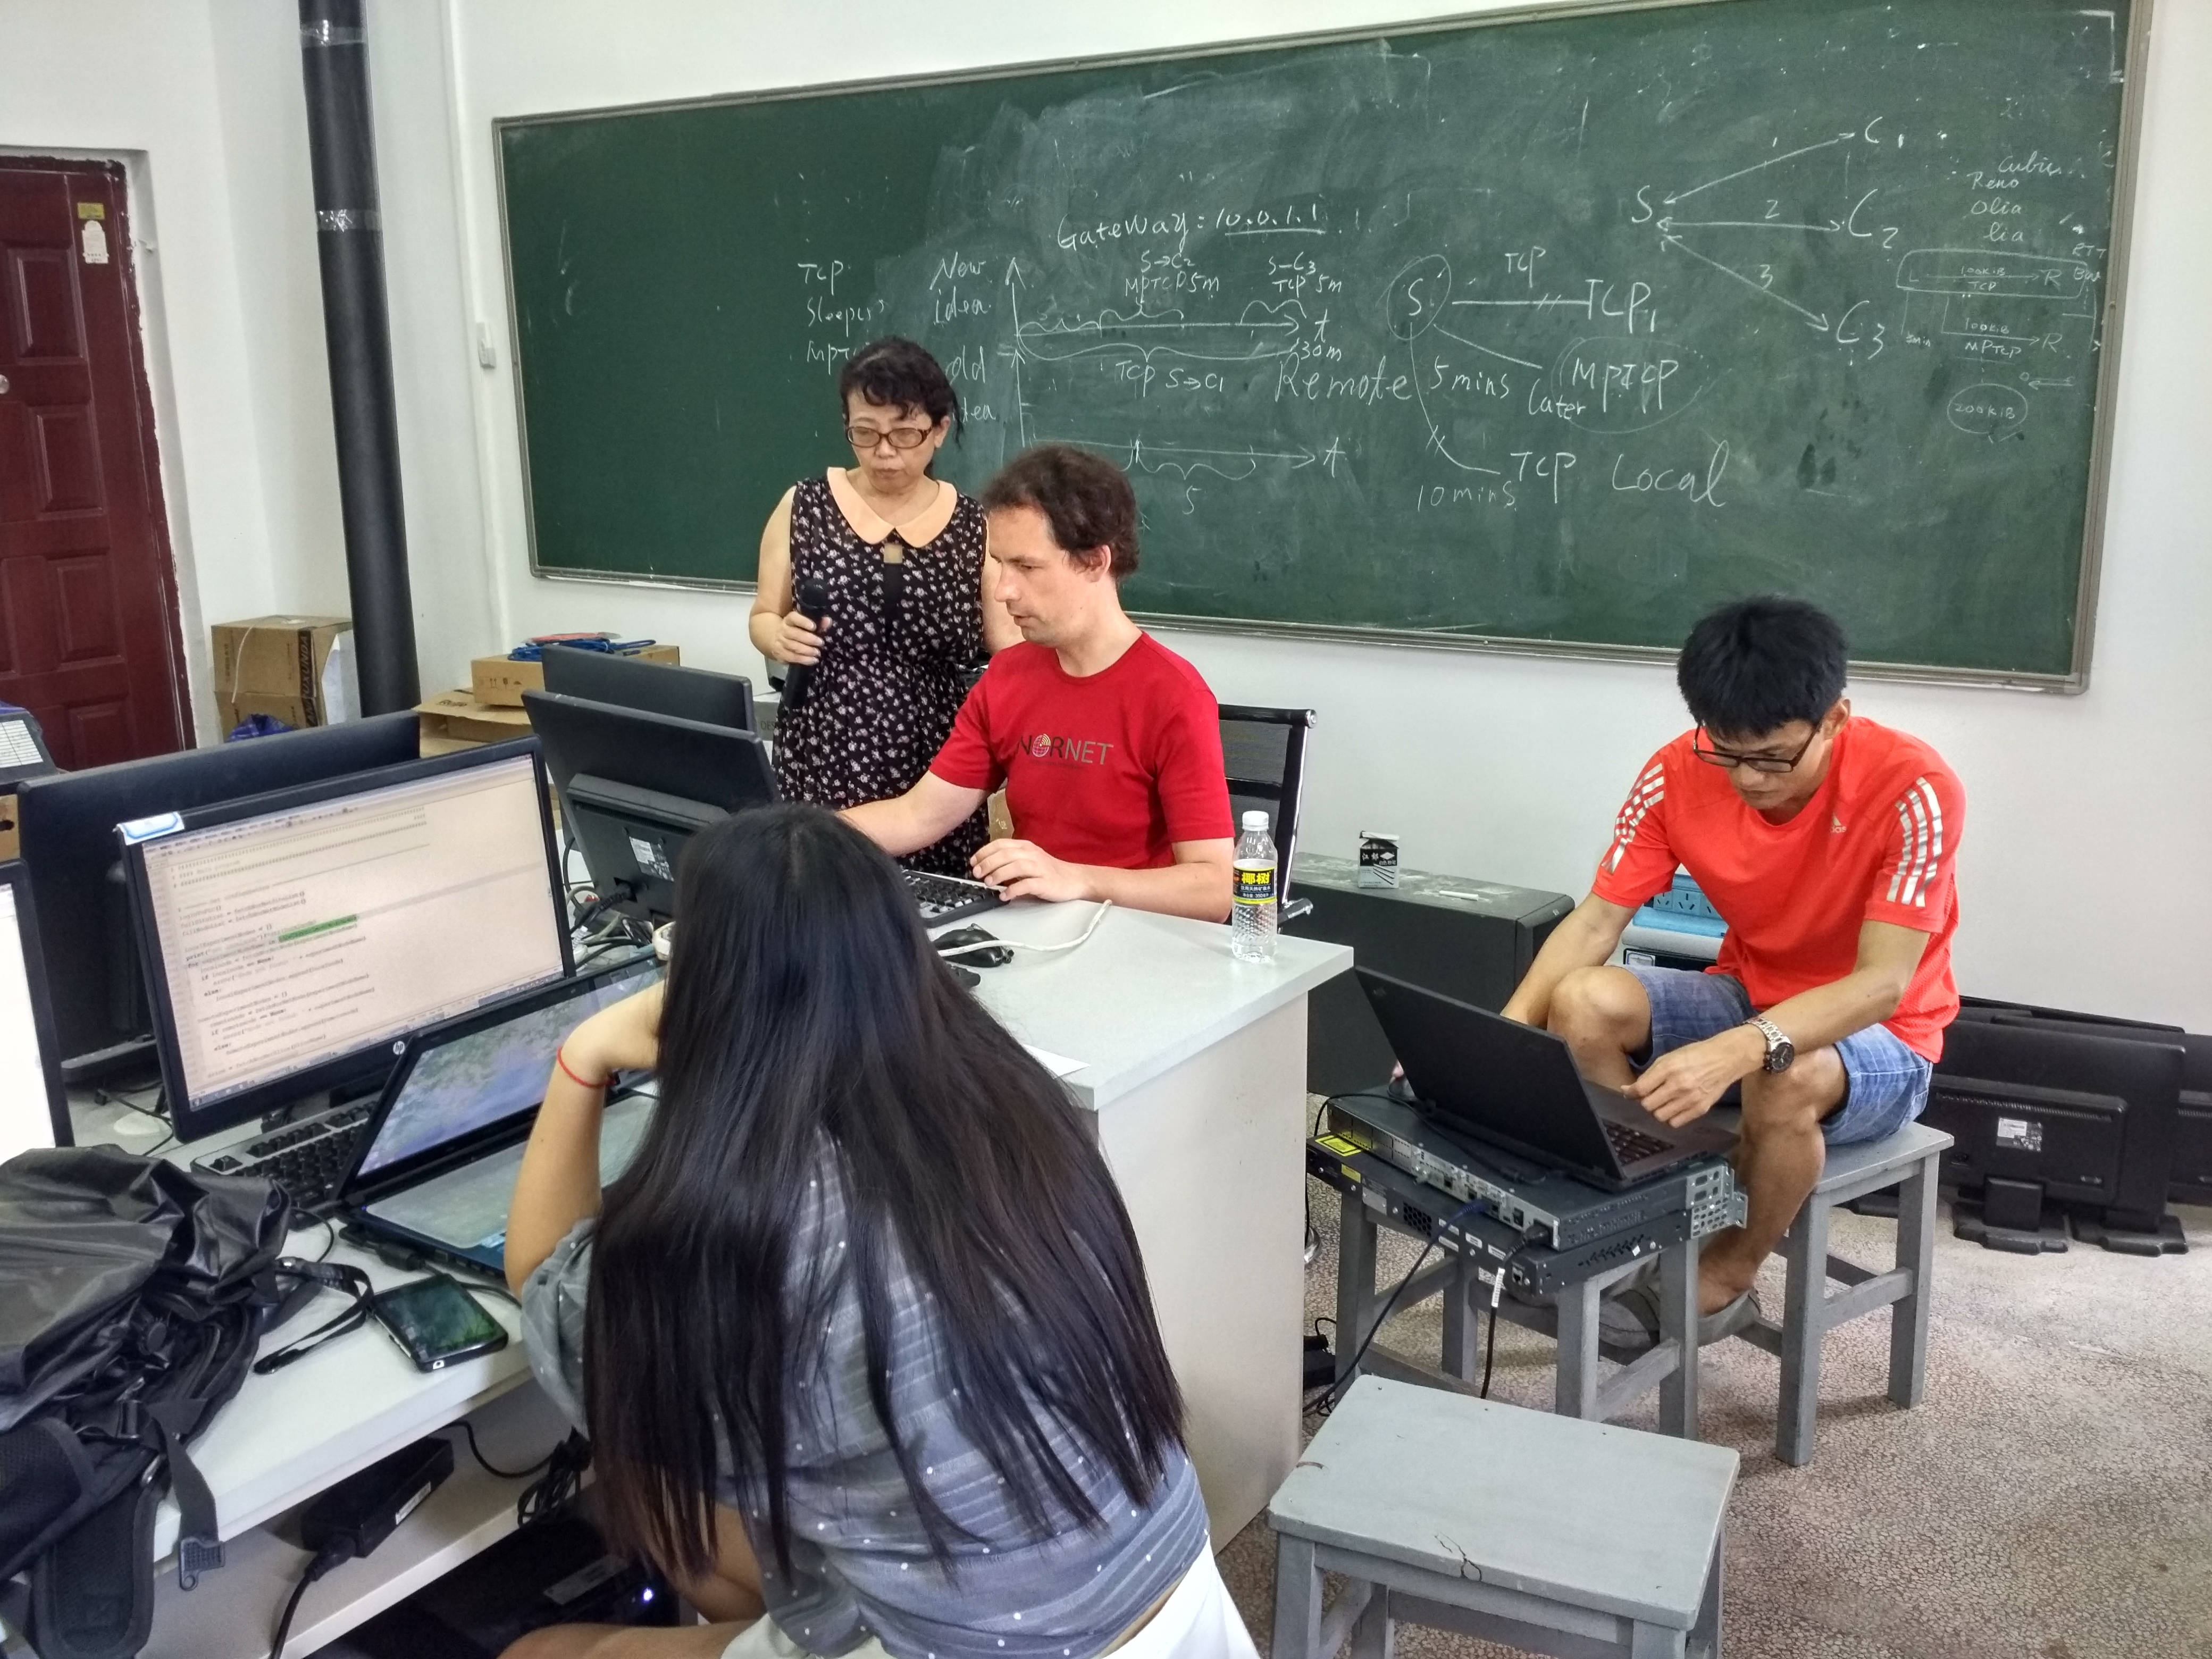 NorNet Tutorial at Hainan University 2016-4